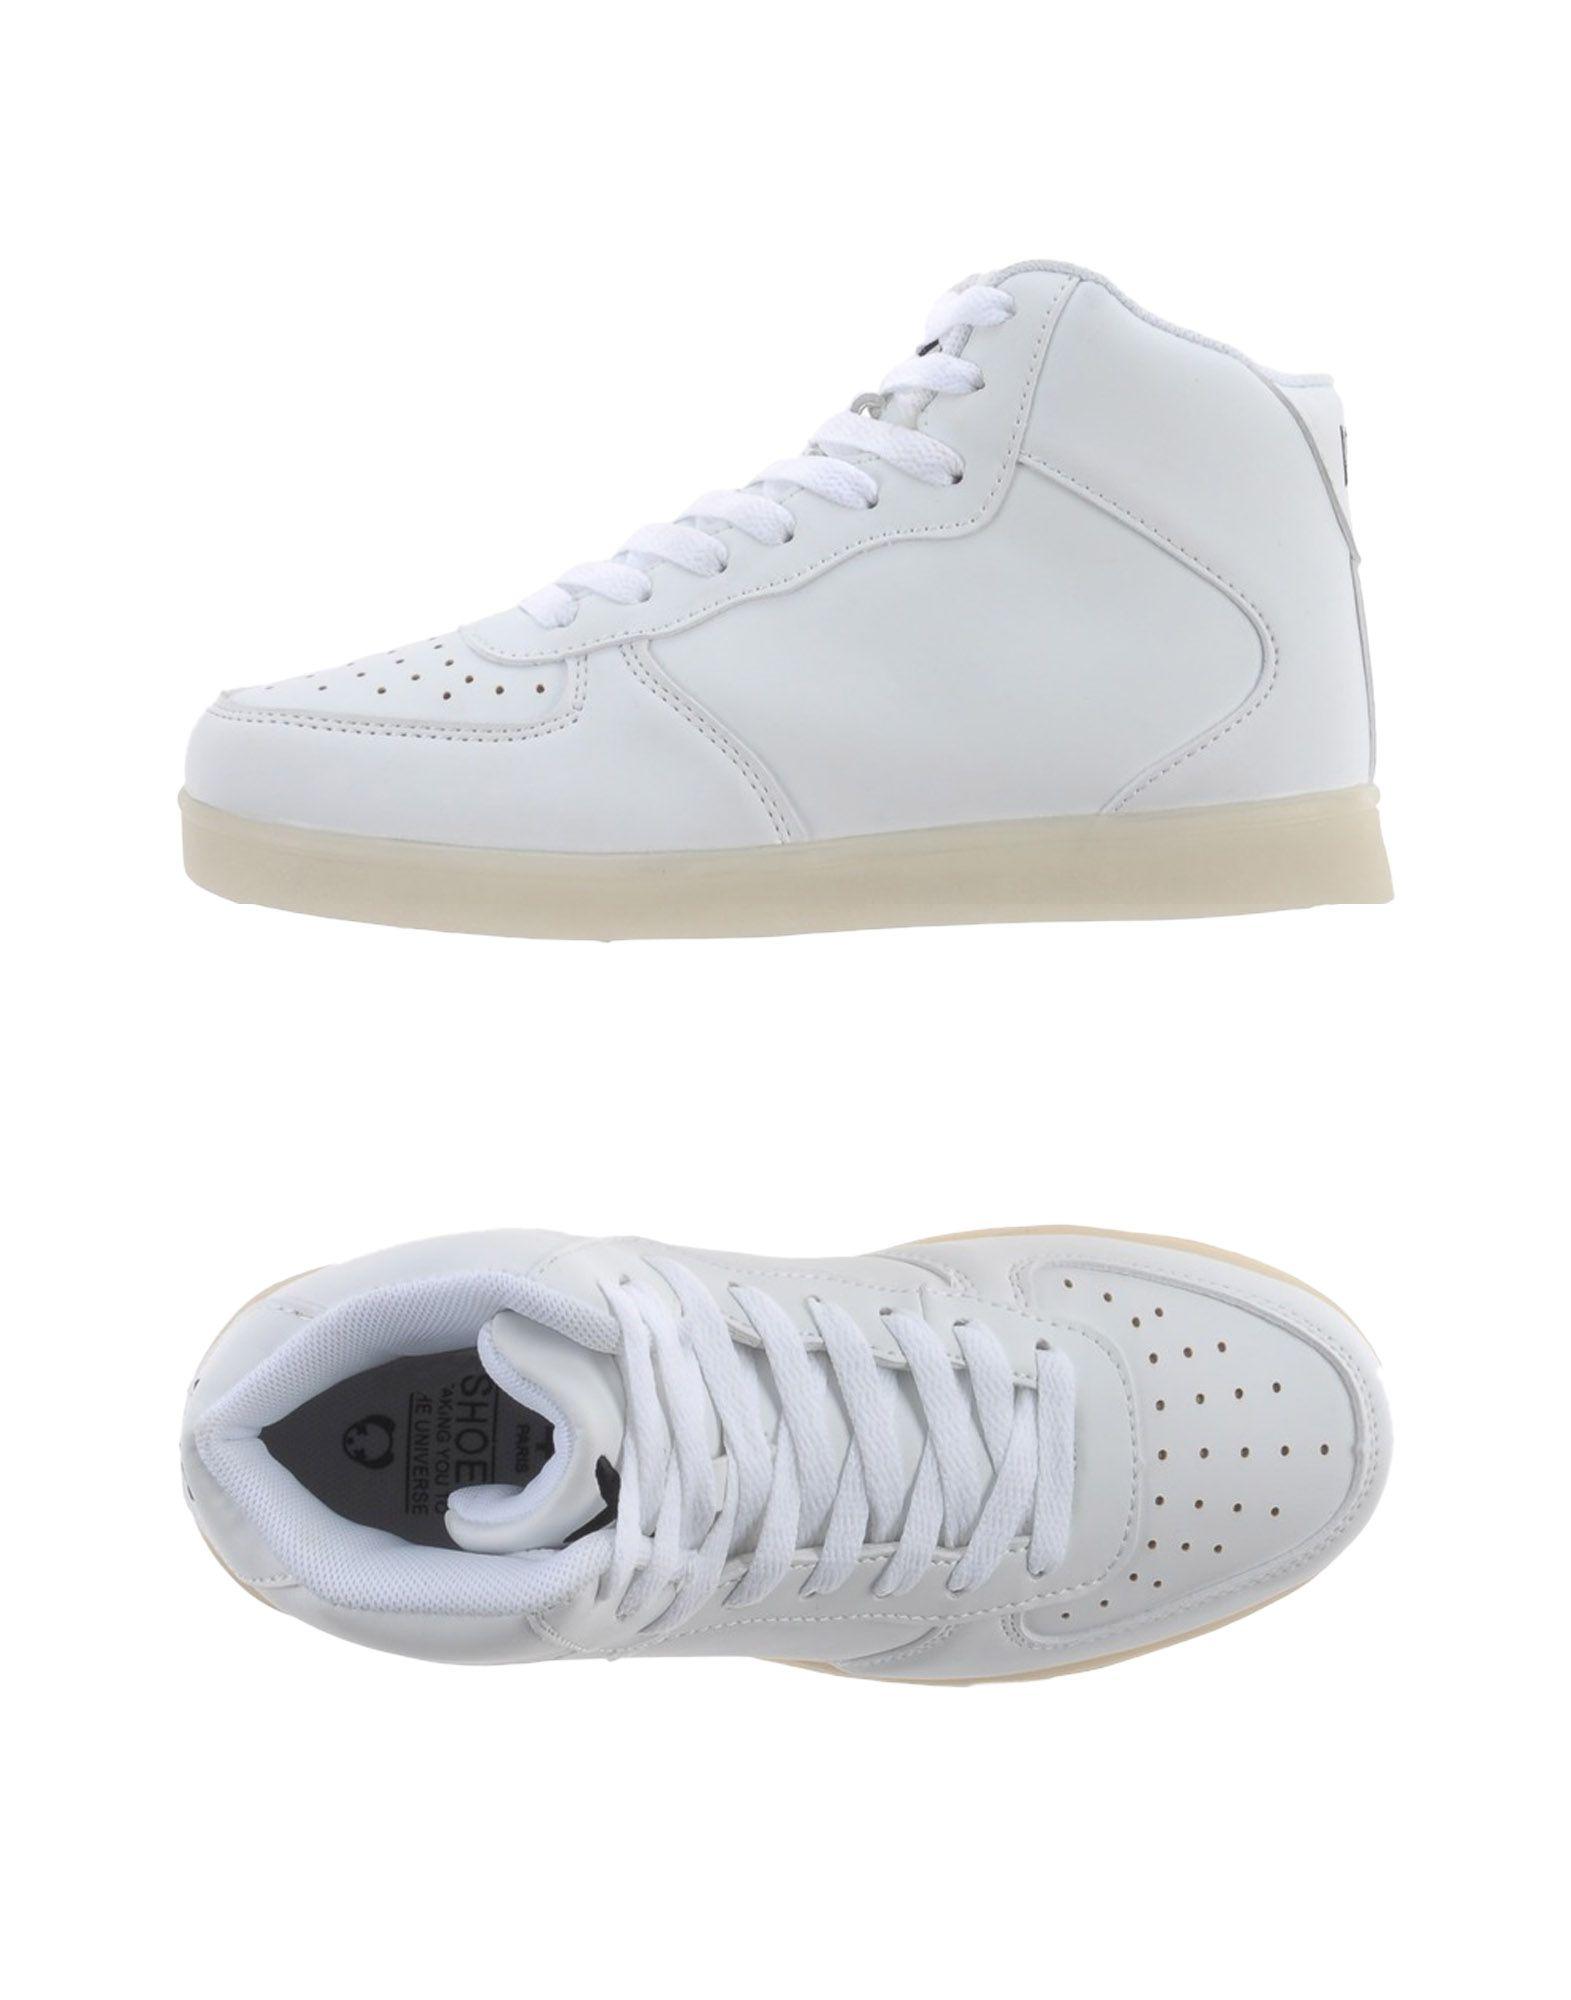 Wize & Ope Sneakers Damen  11042328KV Gute Qualität beliebte Schuhe